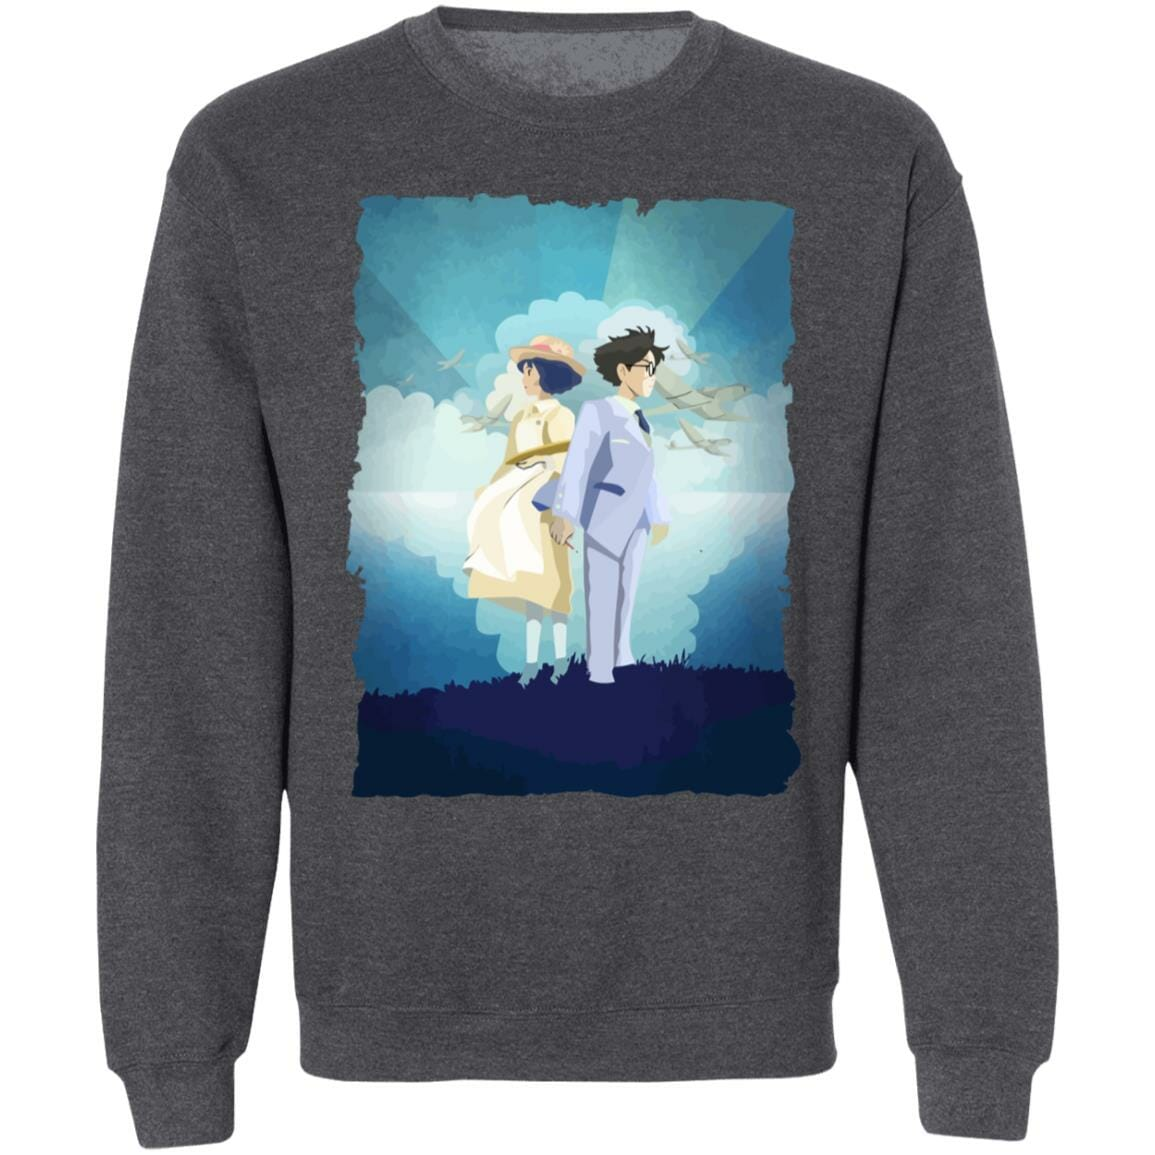 The Wind Rises Graphic Sweatshirt